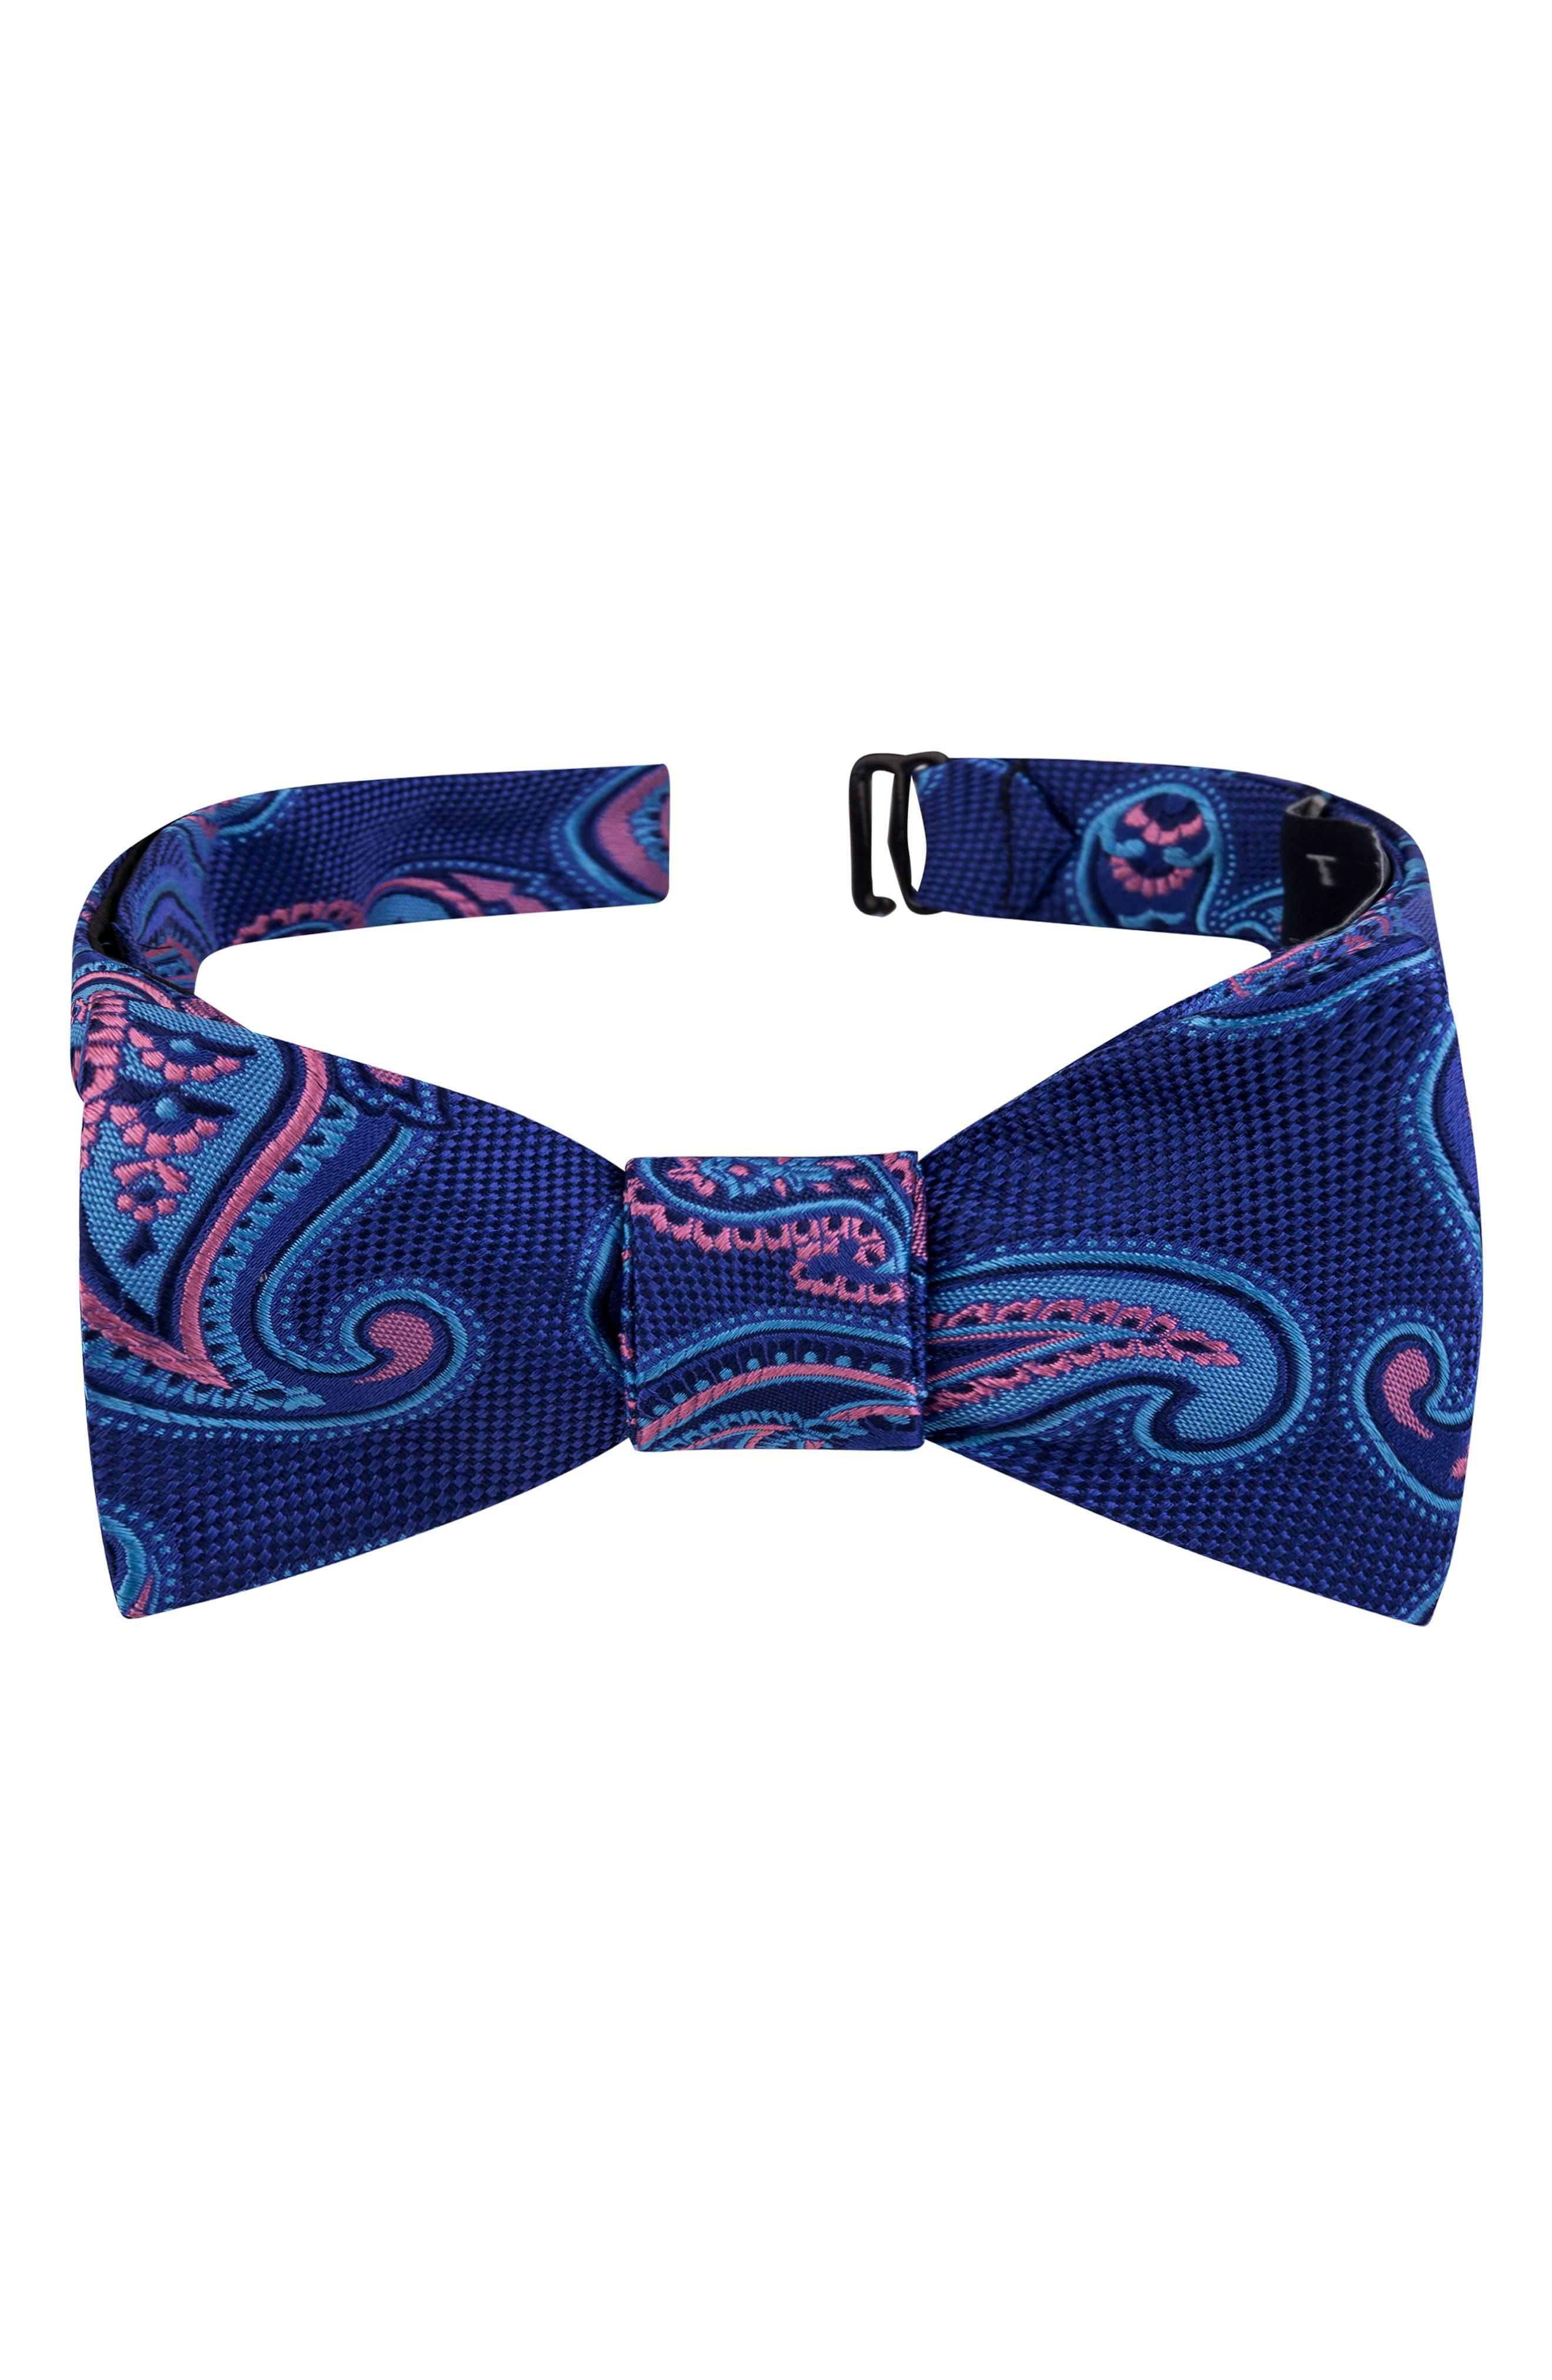 Twin Pine Silk Bow Tie,                             Main thumbnail 1, color,                             BLUE